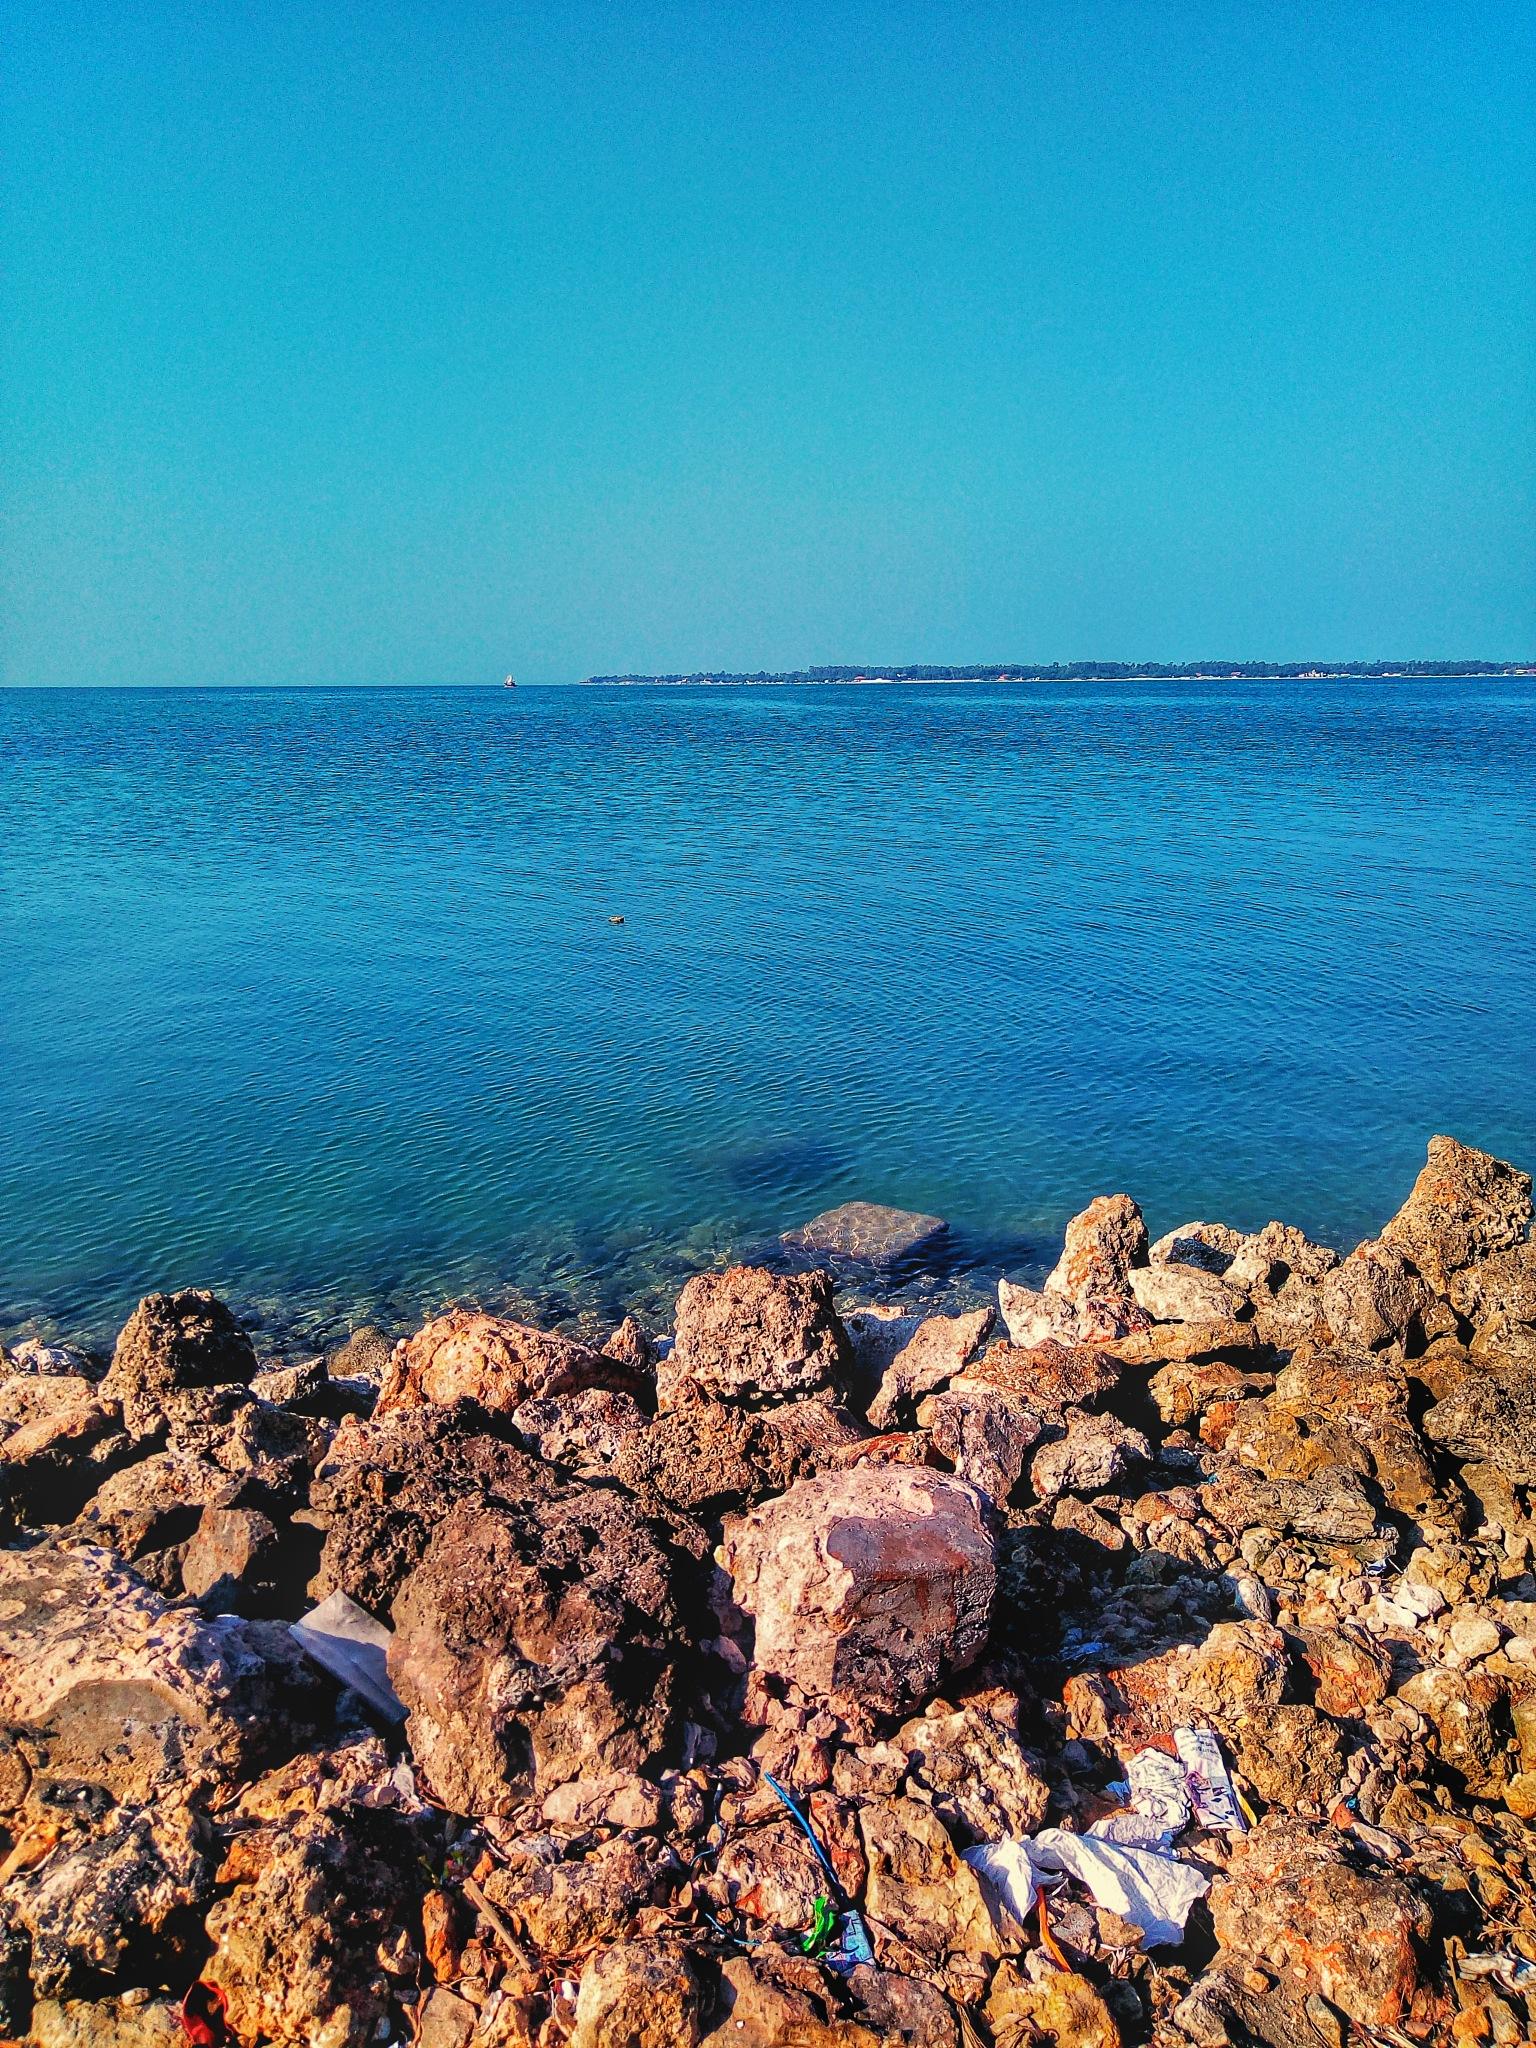 The sky, The Ocean & The Land by Aanjelo Salgado